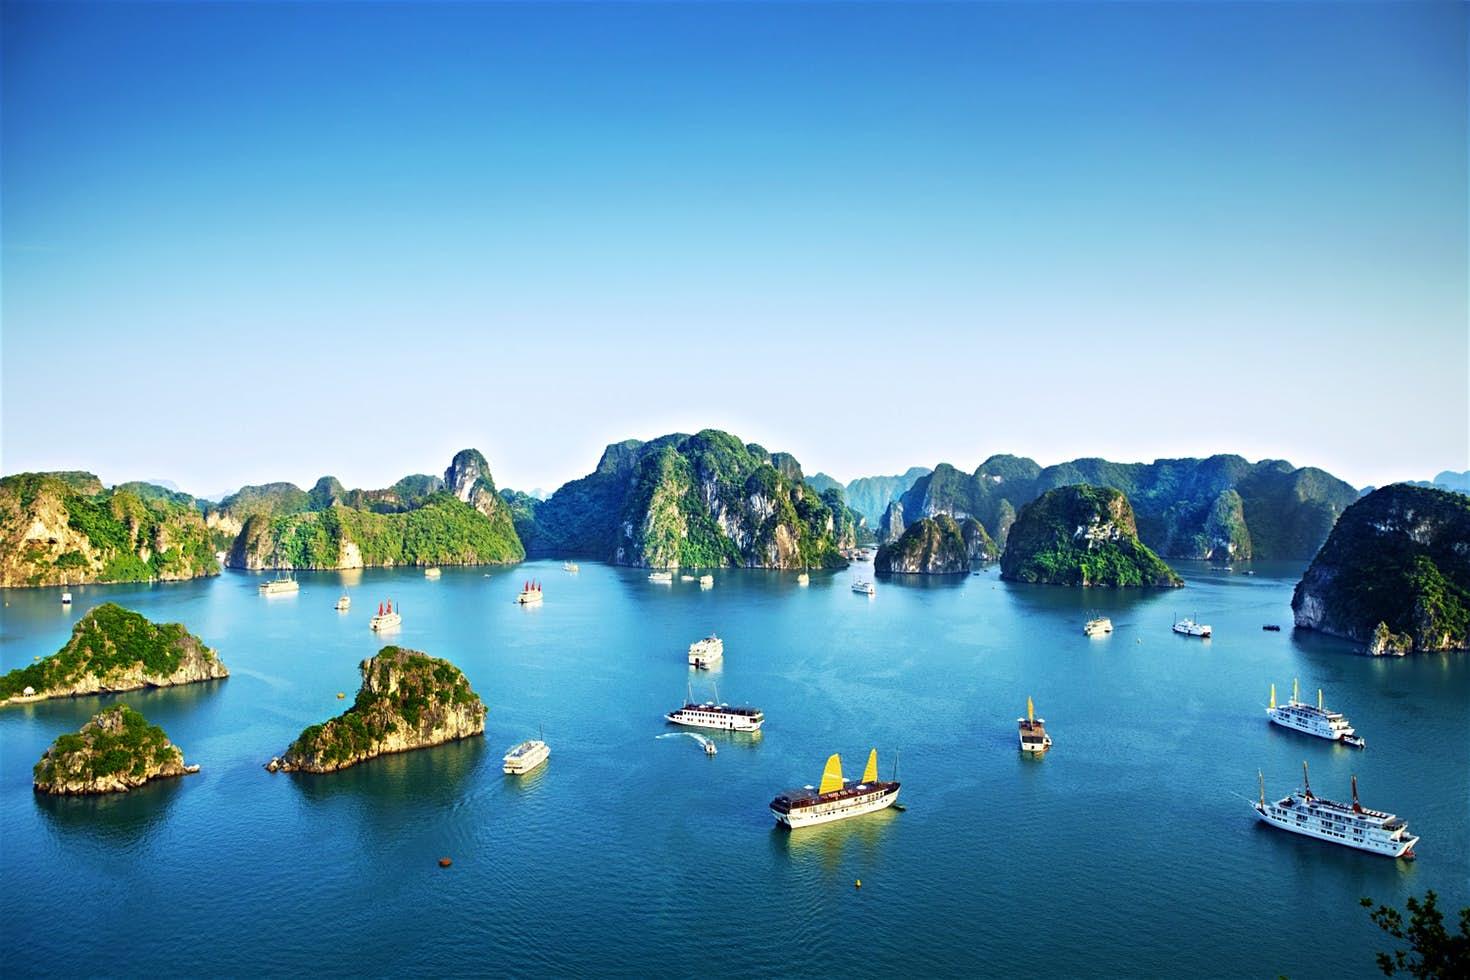 Ha Long Bay, North Vietnam